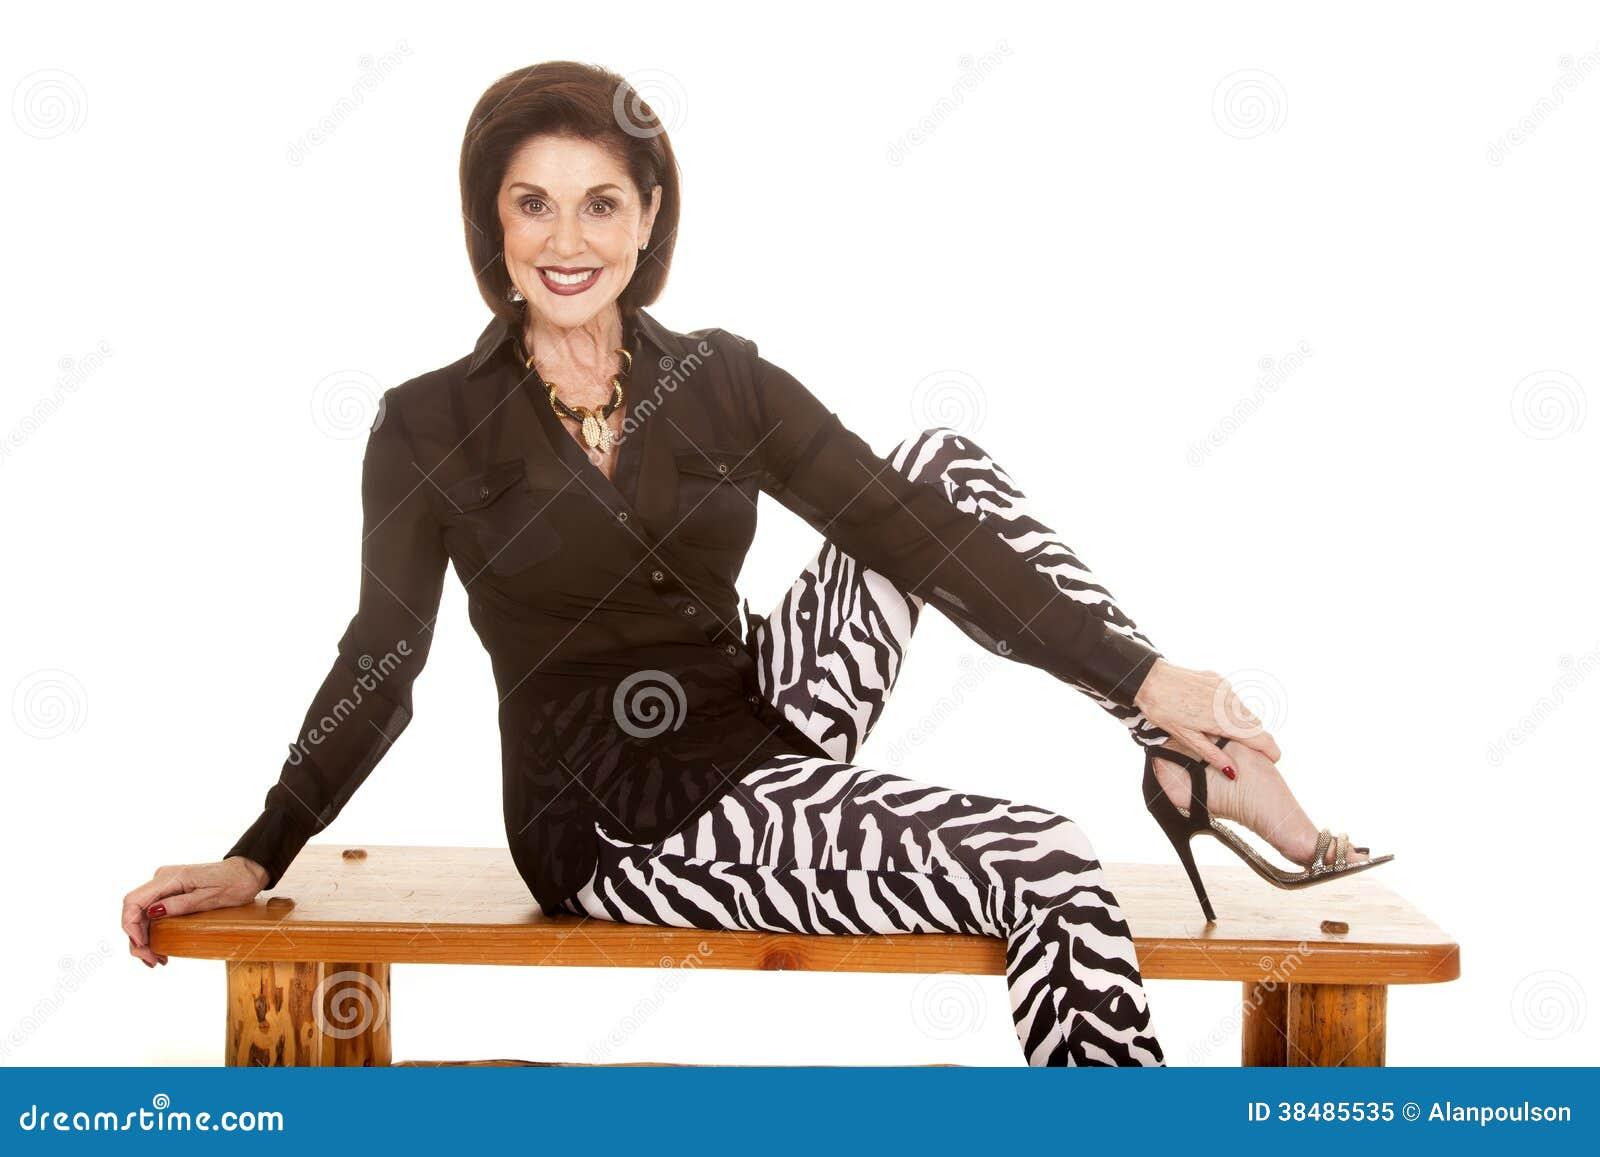 older woman zebra pants sit on bench smiling stock image